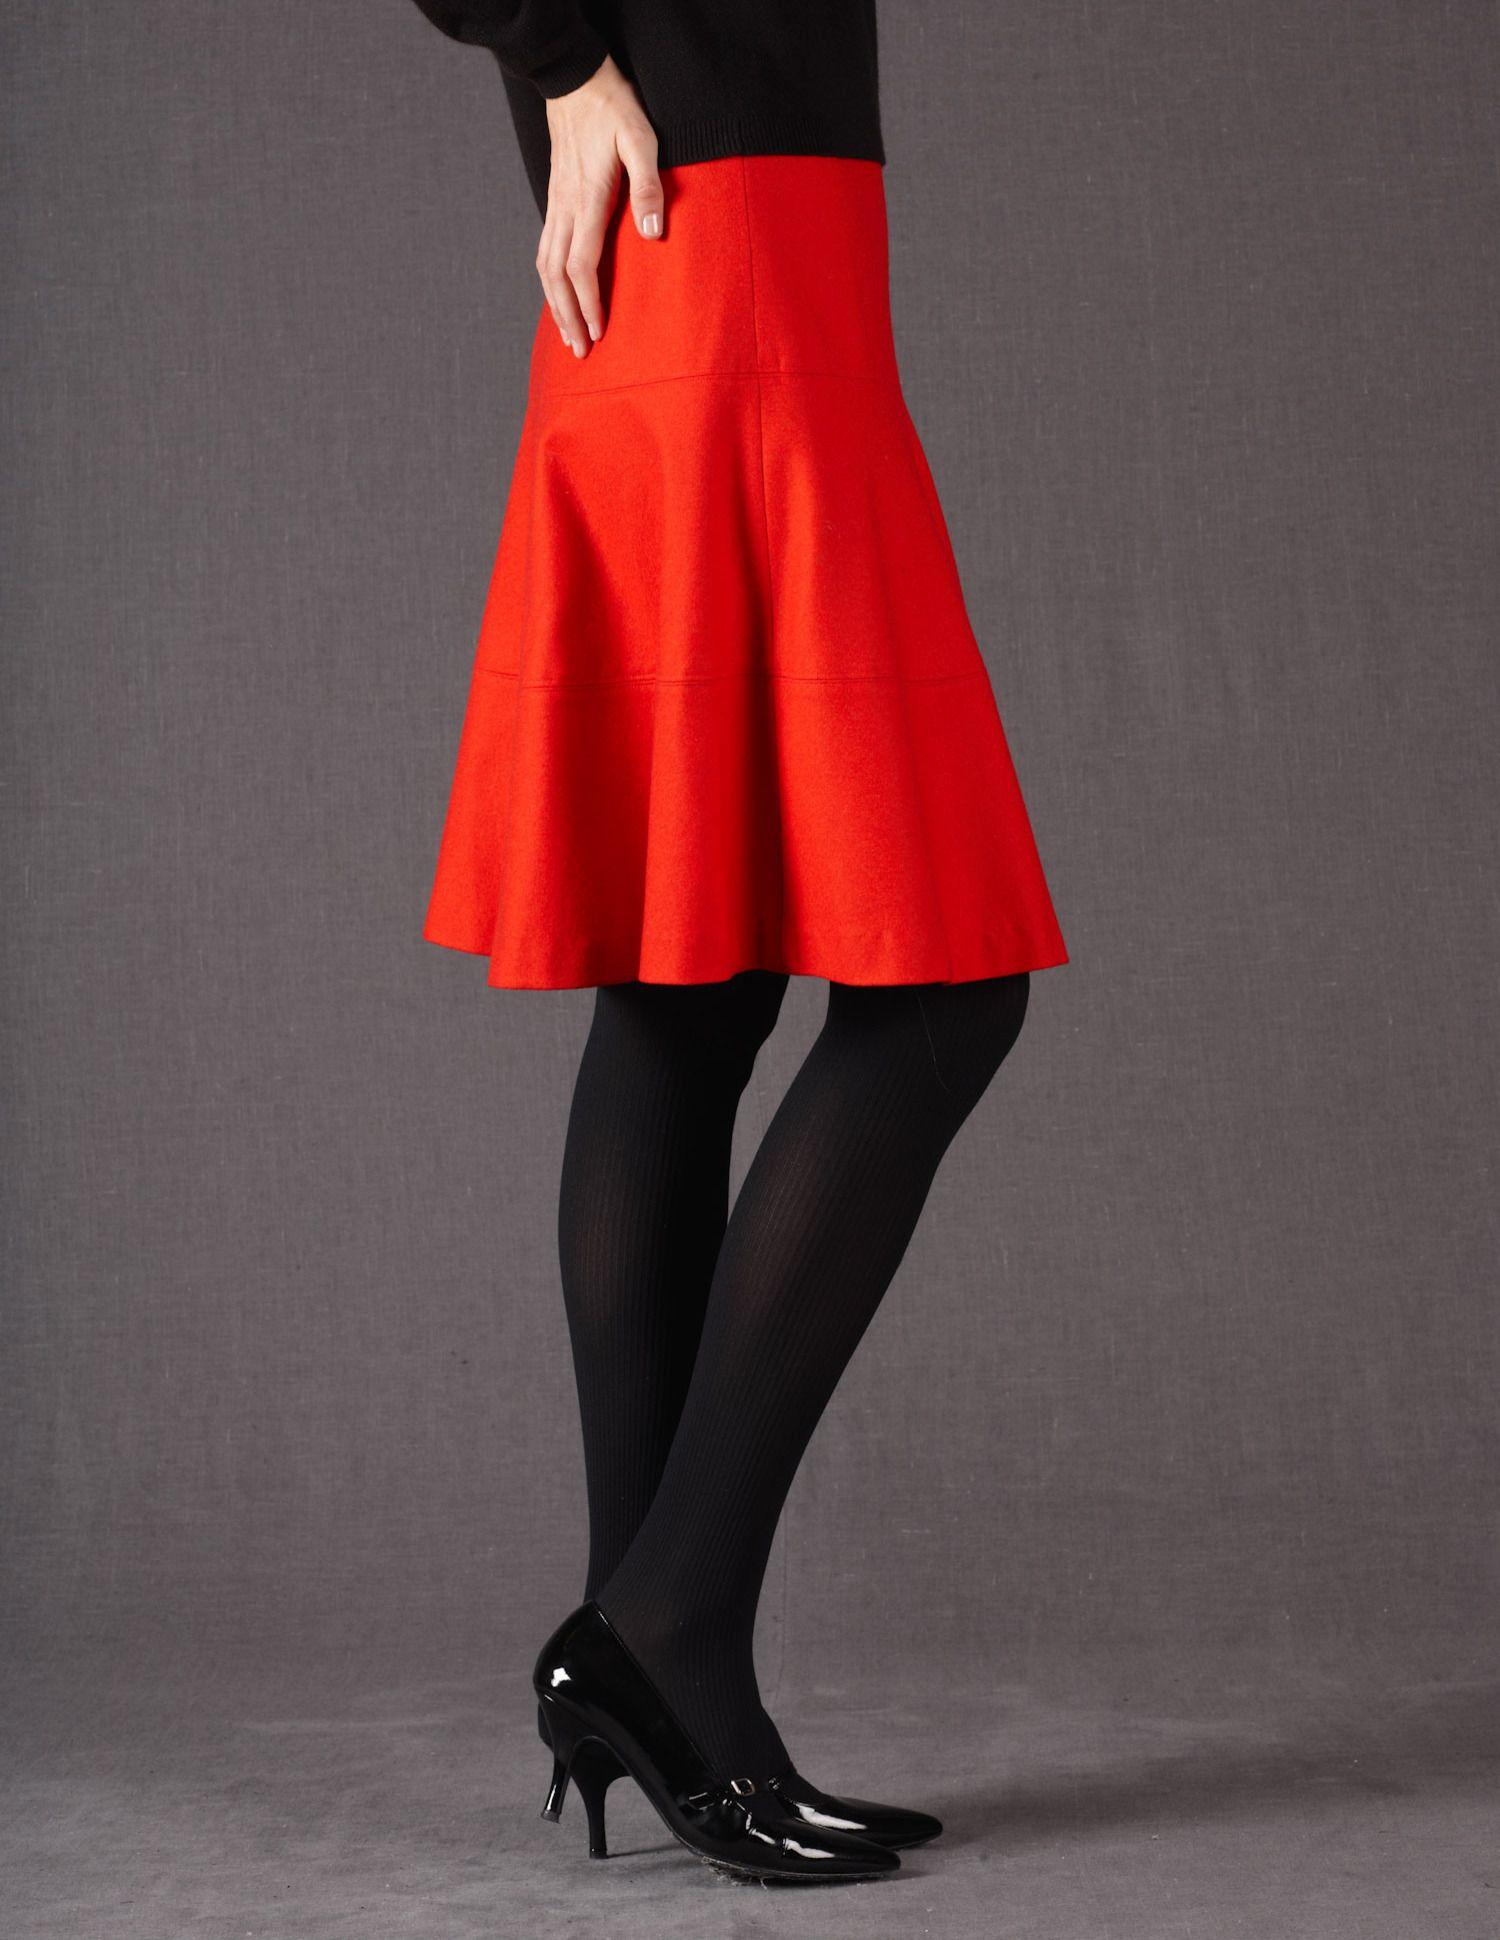 8a567d7f35e53 Red wool skirt. I love it! Boden Uk, Wool Skirts, Winter Looks